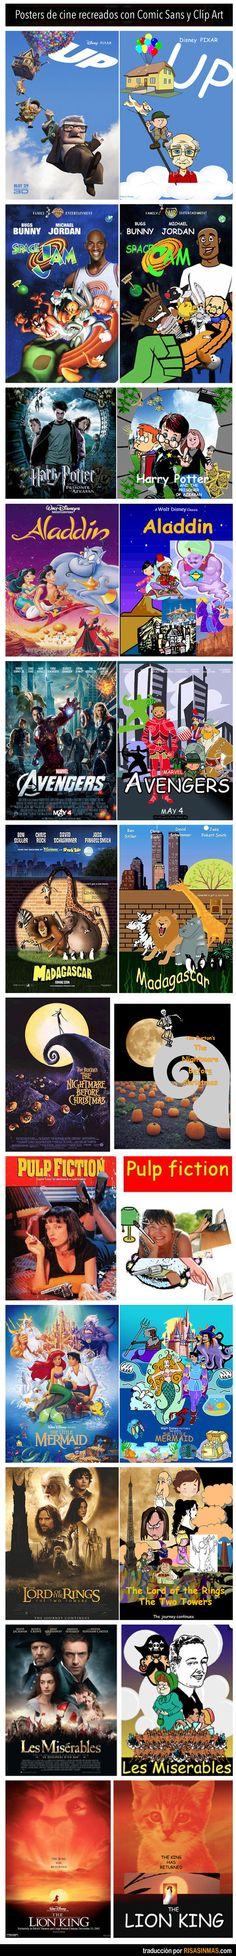 Posters de cine recreados con Comic Sans y clip art.  Haha, I can't stand clip art OR comic sans. Love this!